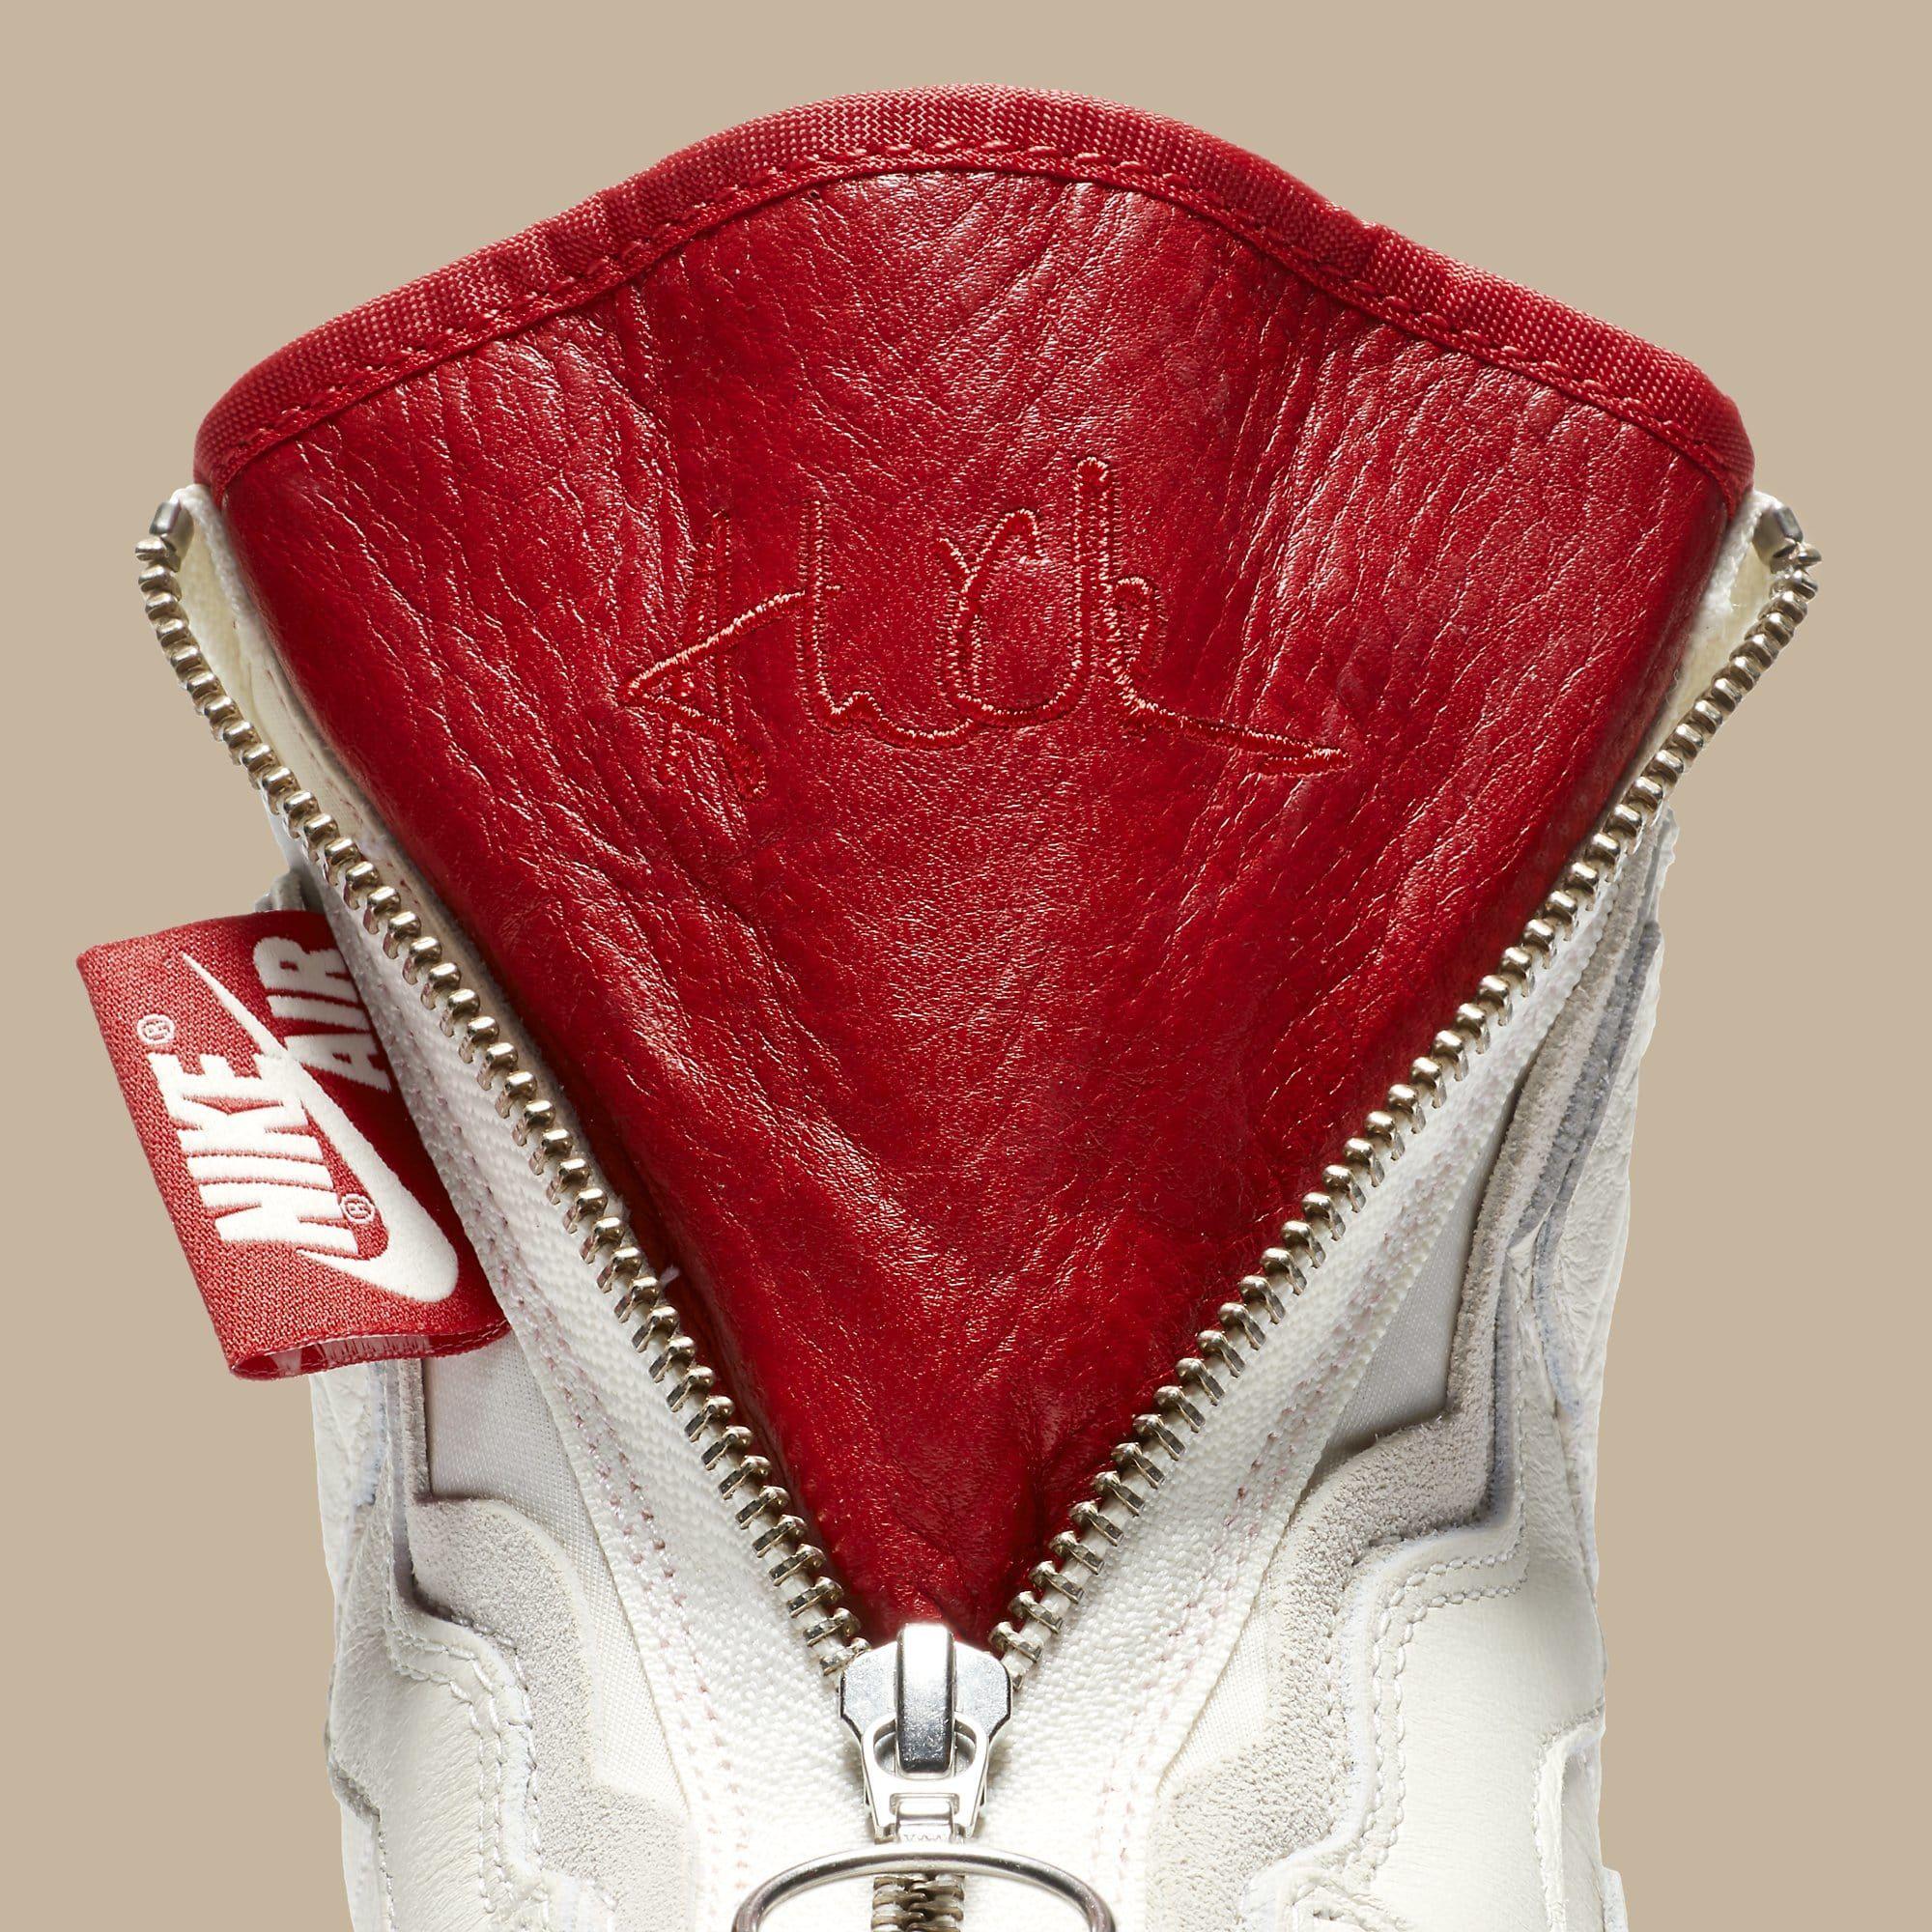 new style f6b02 4ceaa Nike Air Jordan I